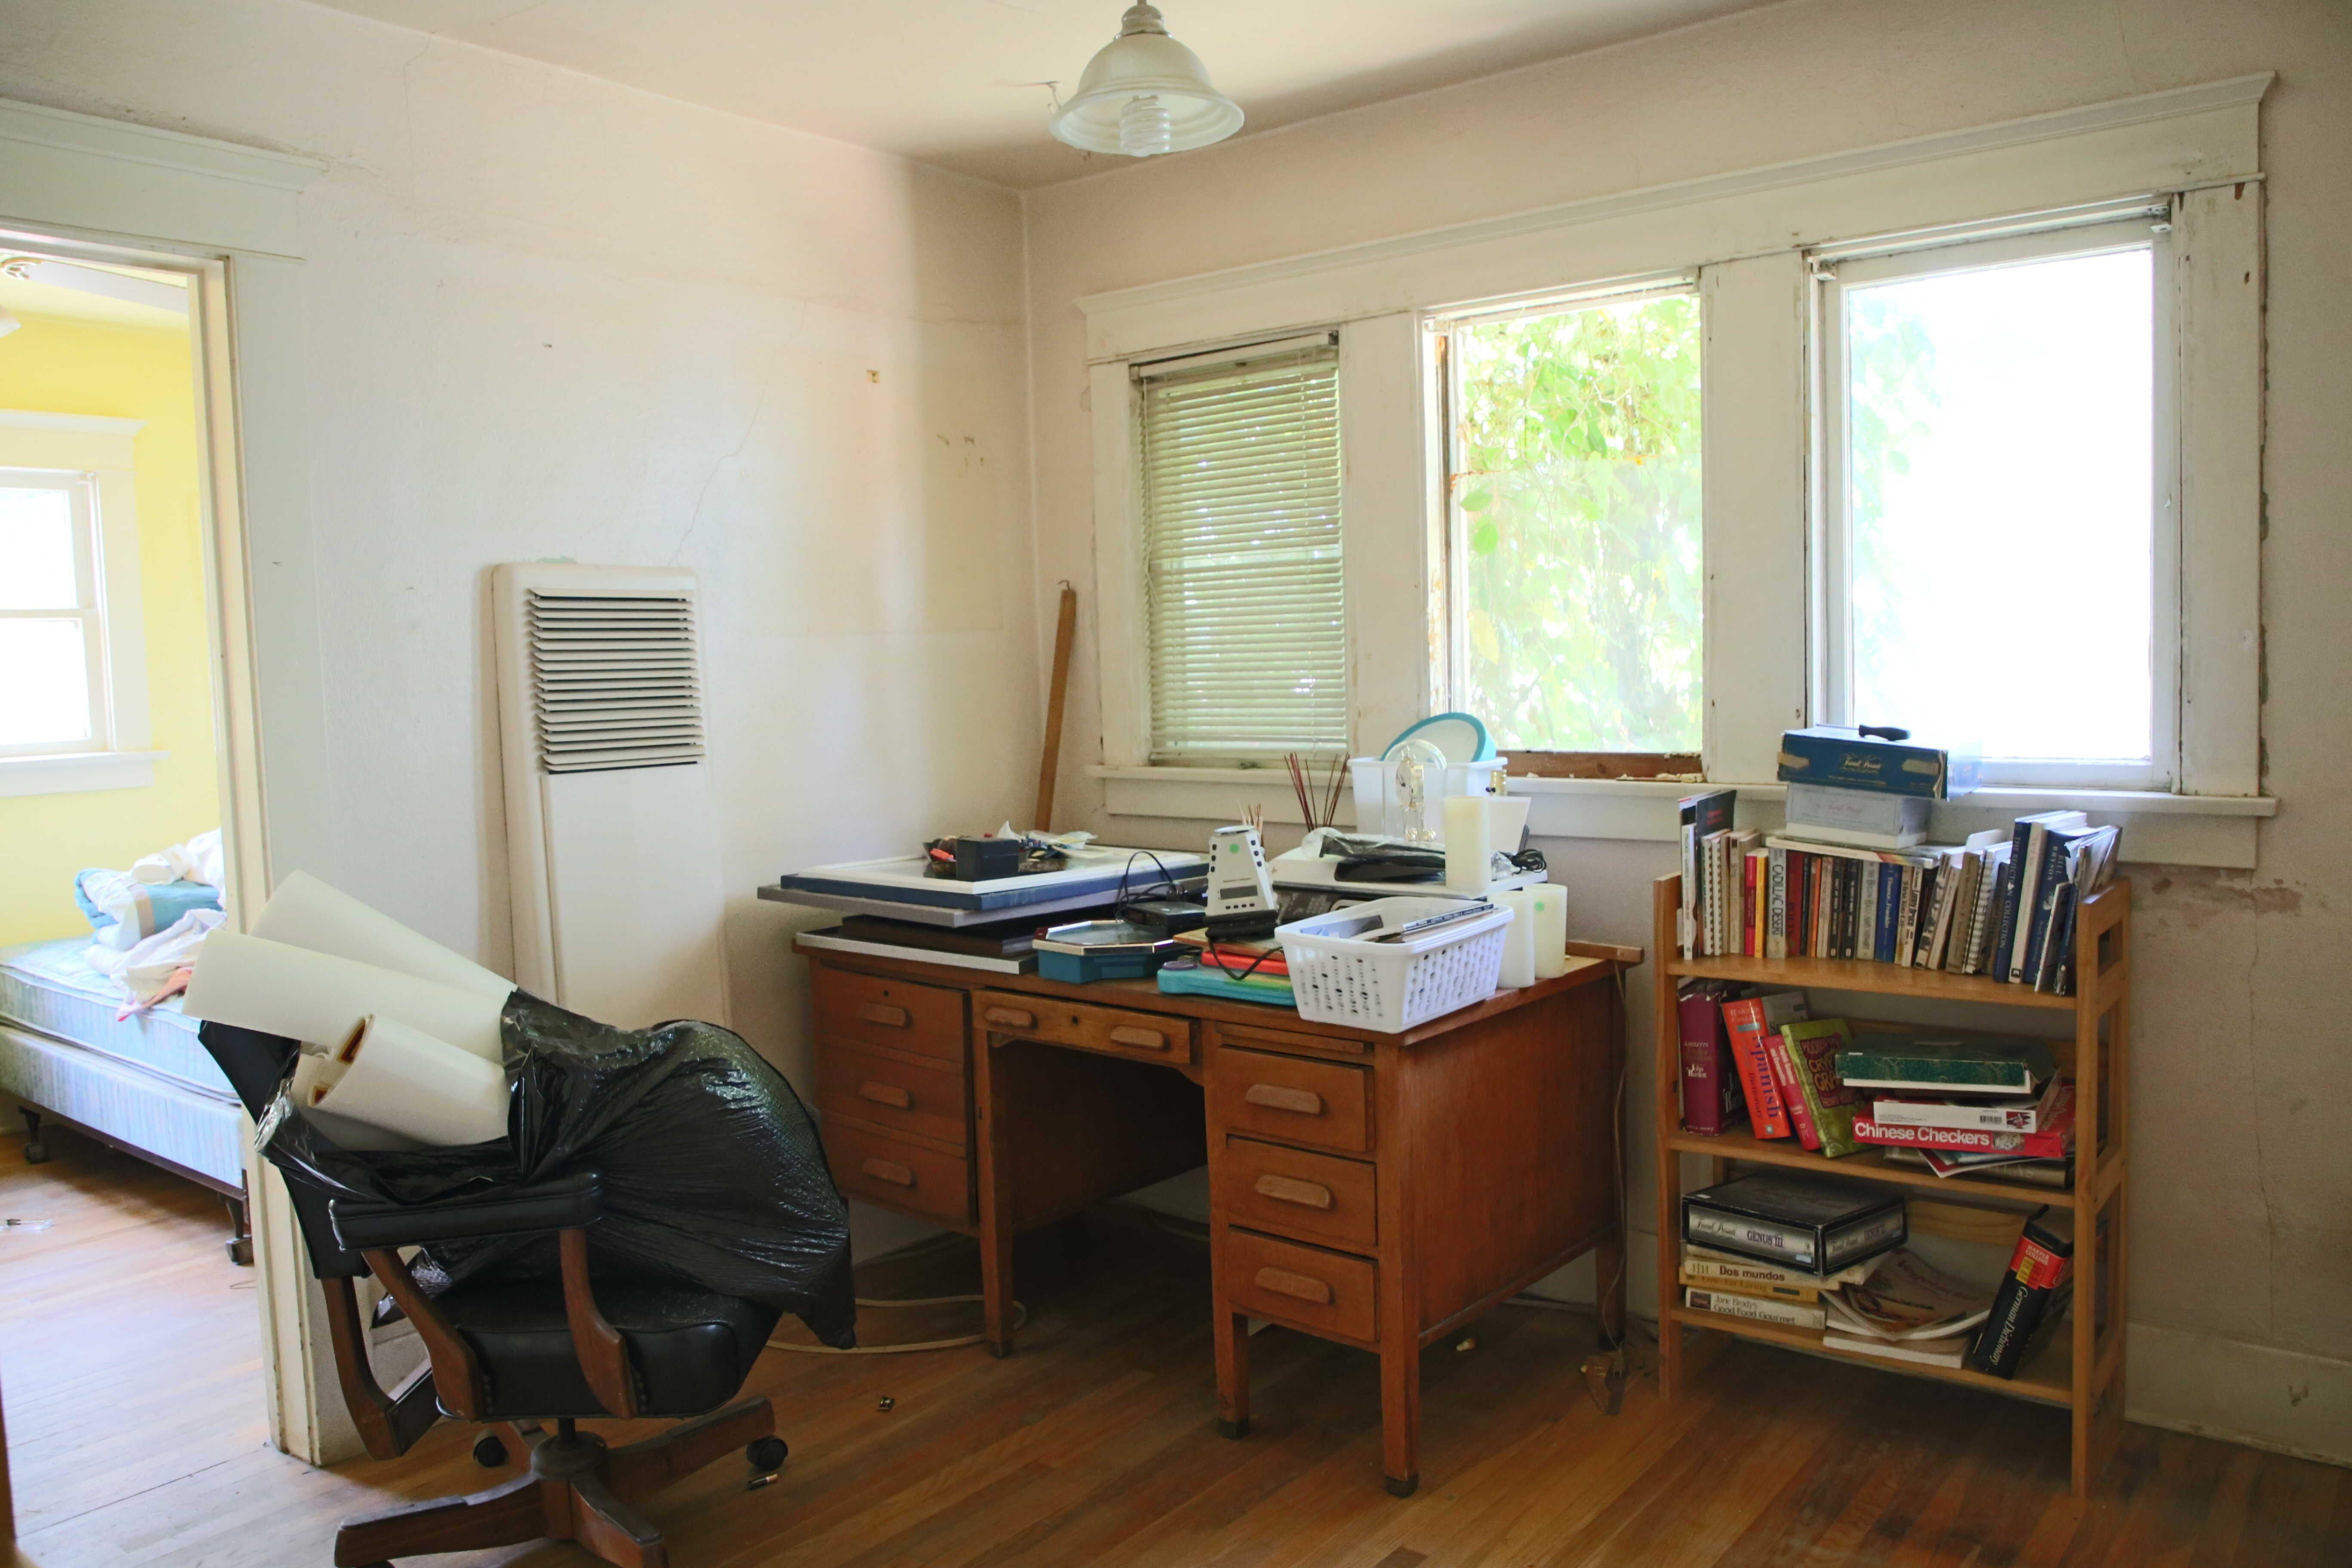 Middle bedroom with pocket windows and original hardwood floors.